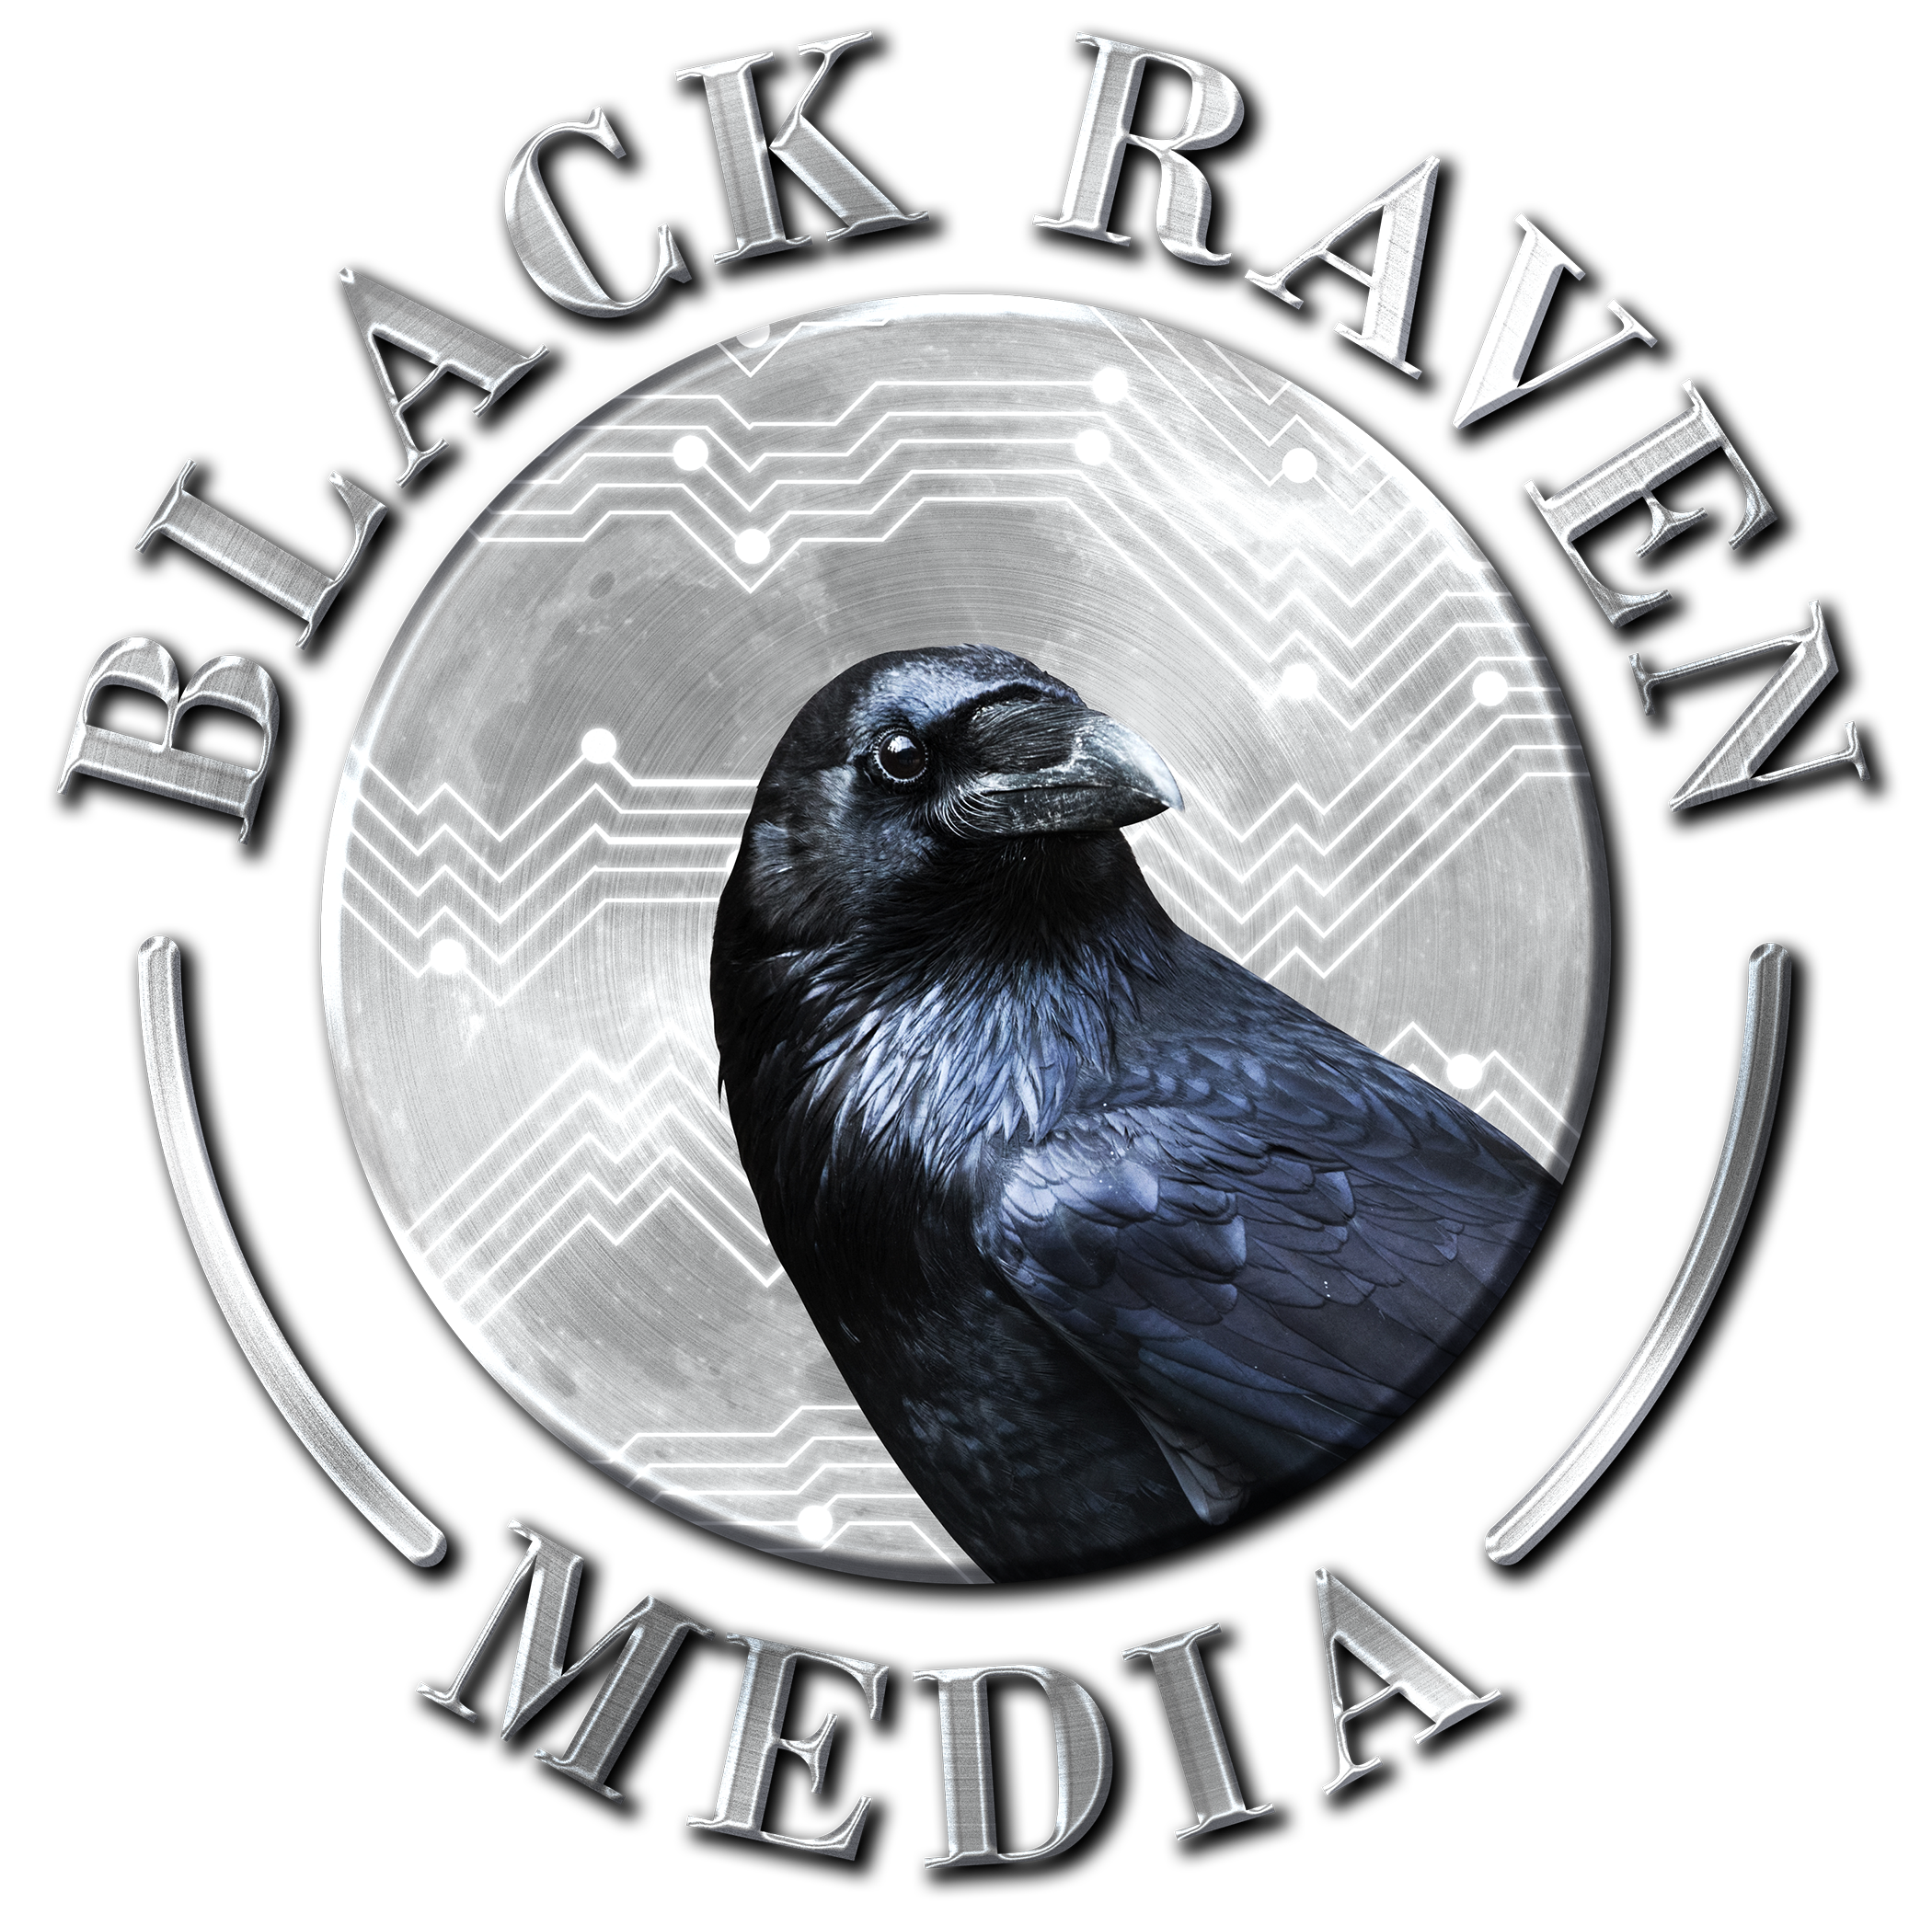 Black Raven Media LLC